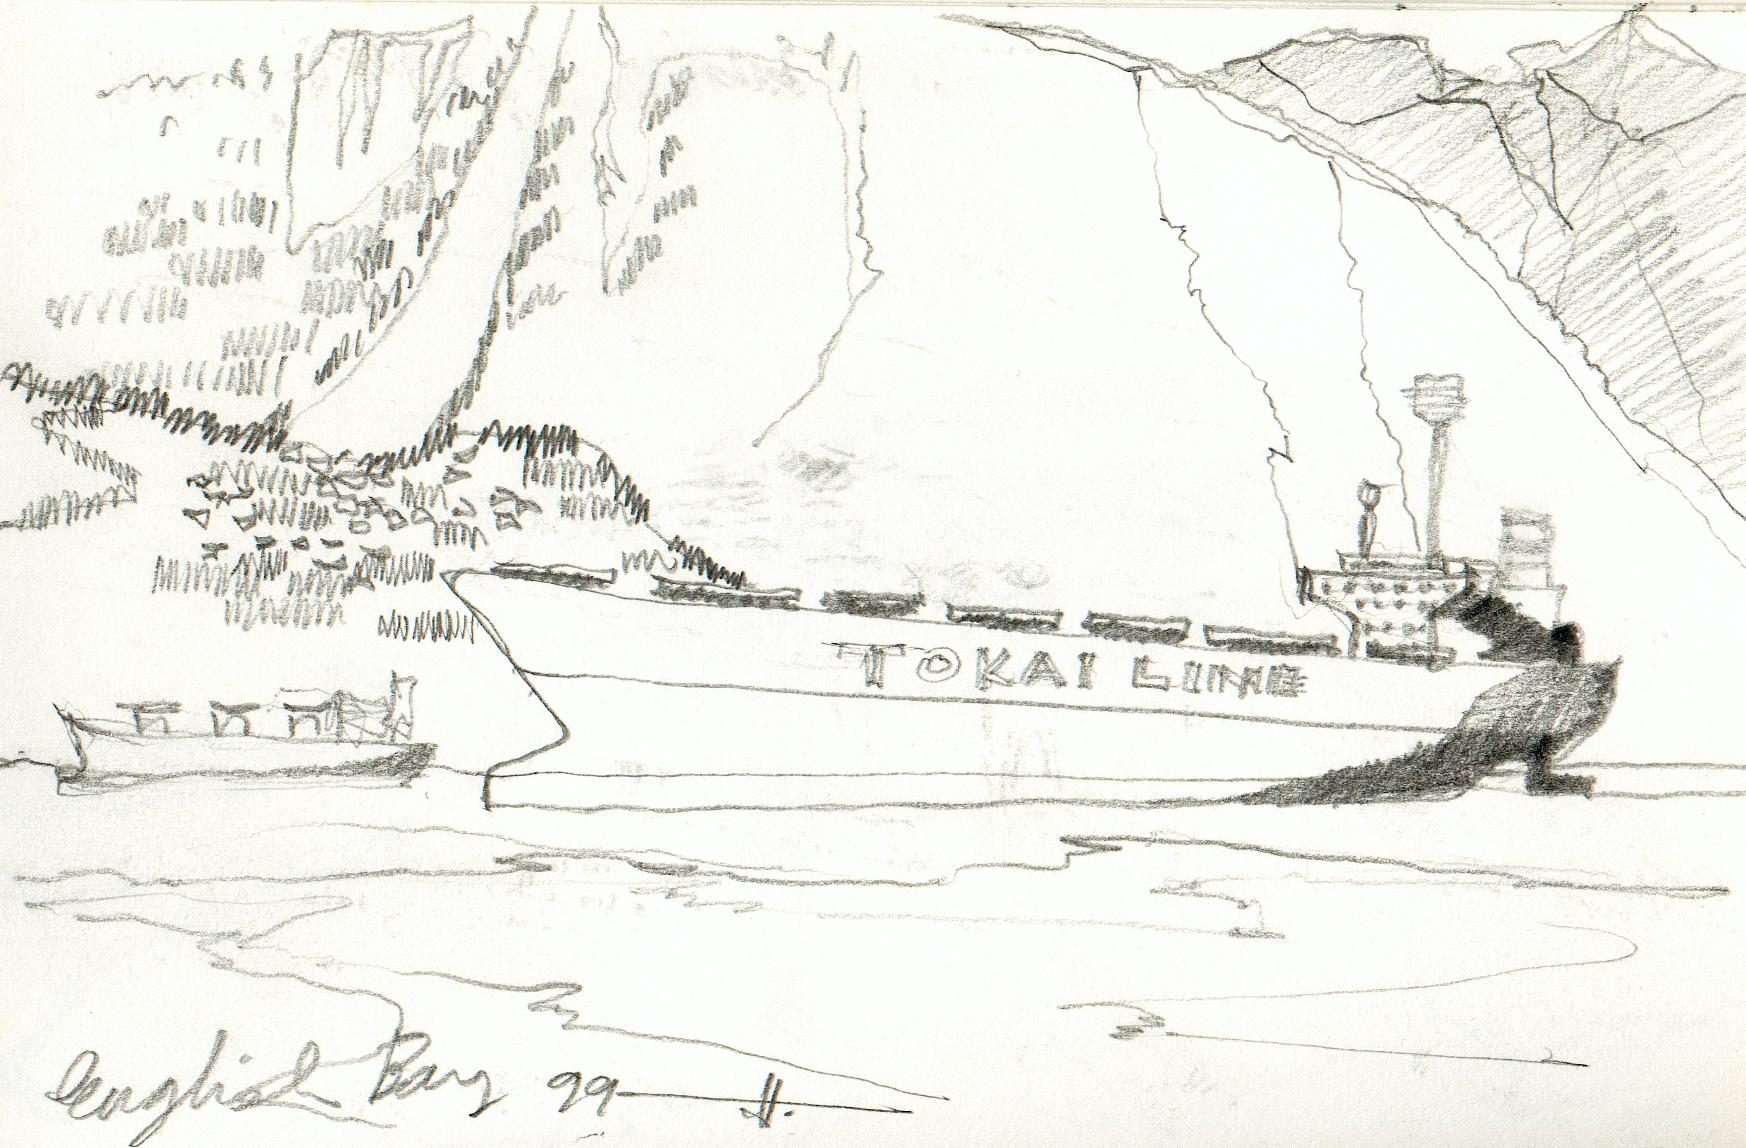 Tanker, English Bay  Vancouver, BC 1999